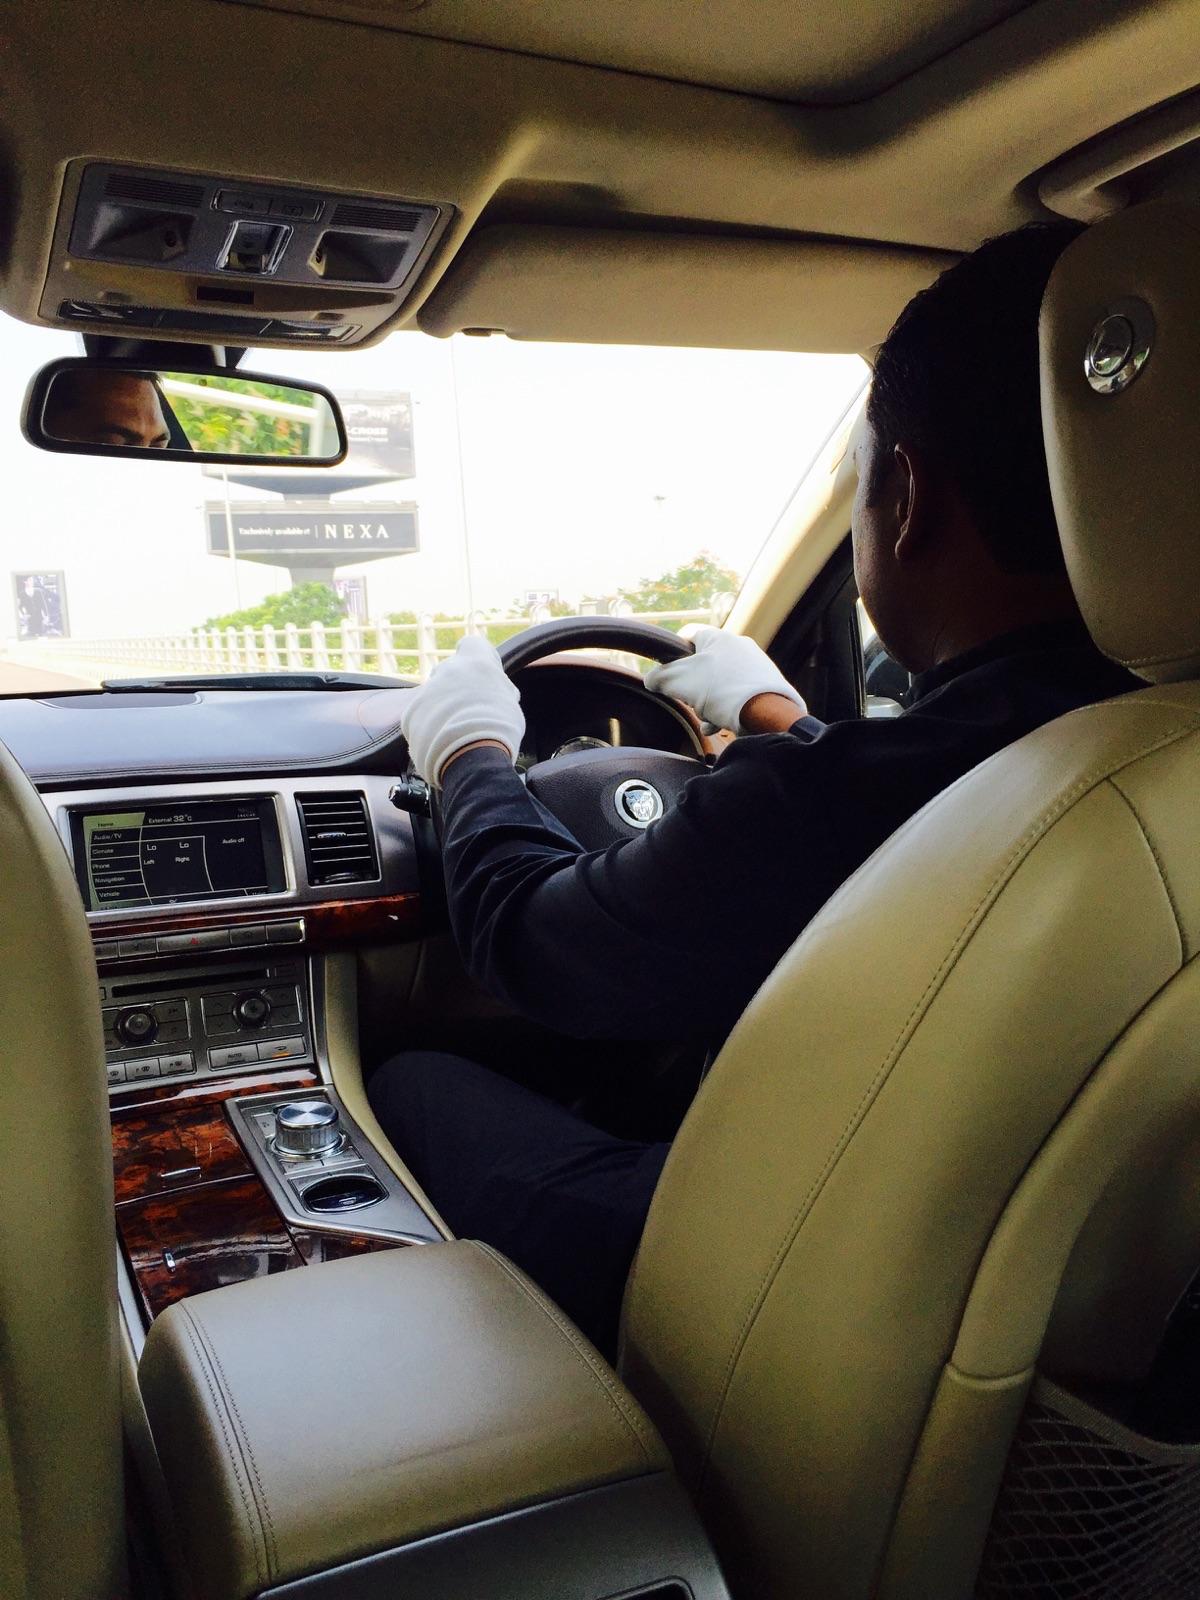 jaguar car luxury hotel Hyderabad, luxury palace hyderabad, Taj Falaknuma Palace Hyderabad, taj hotel hyderabad,